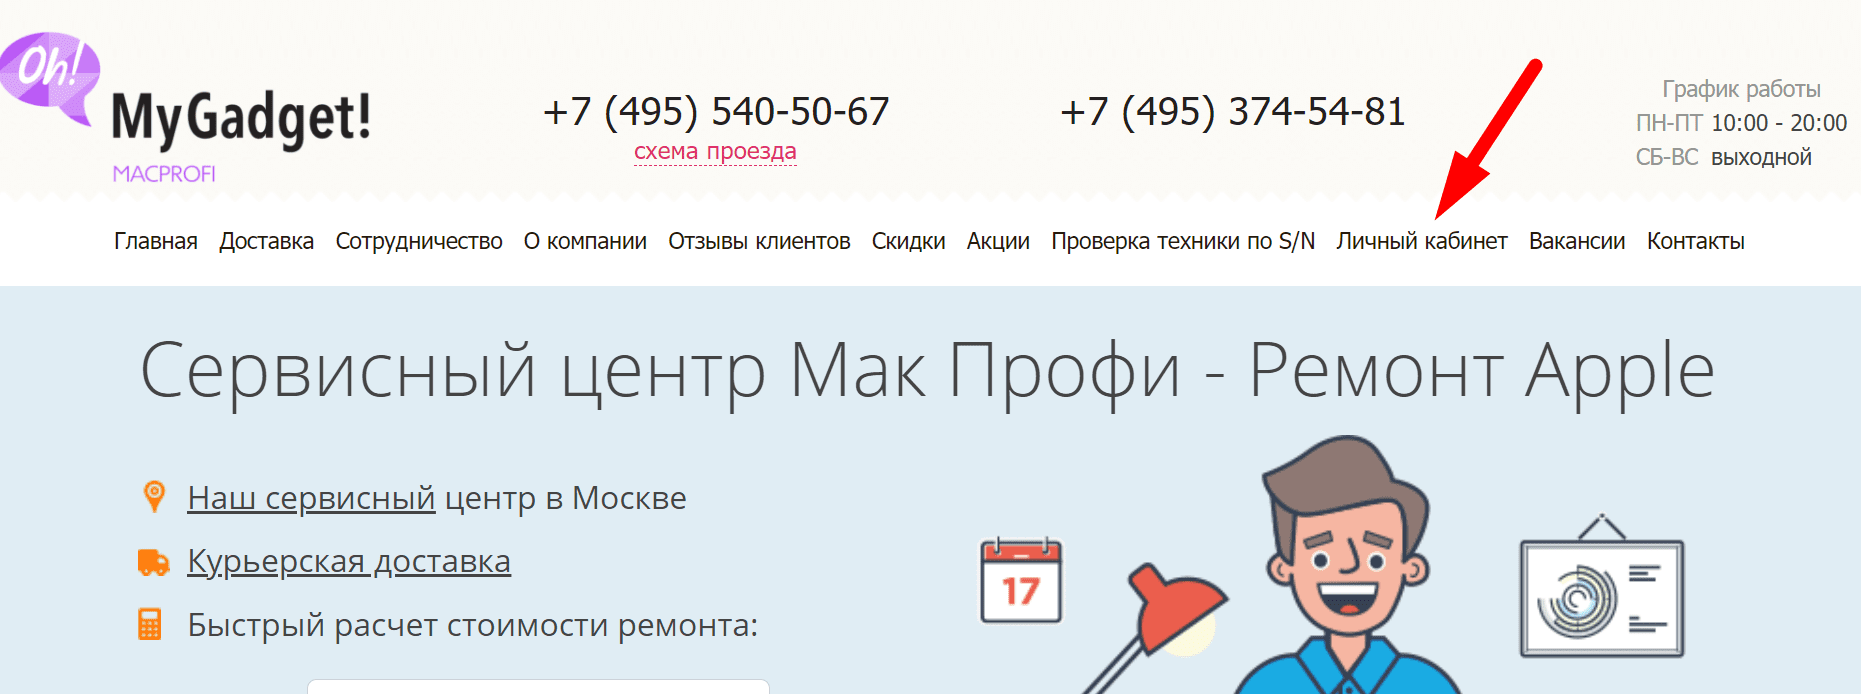 Ссылка на сайт сервисного центра «Мак Профи»